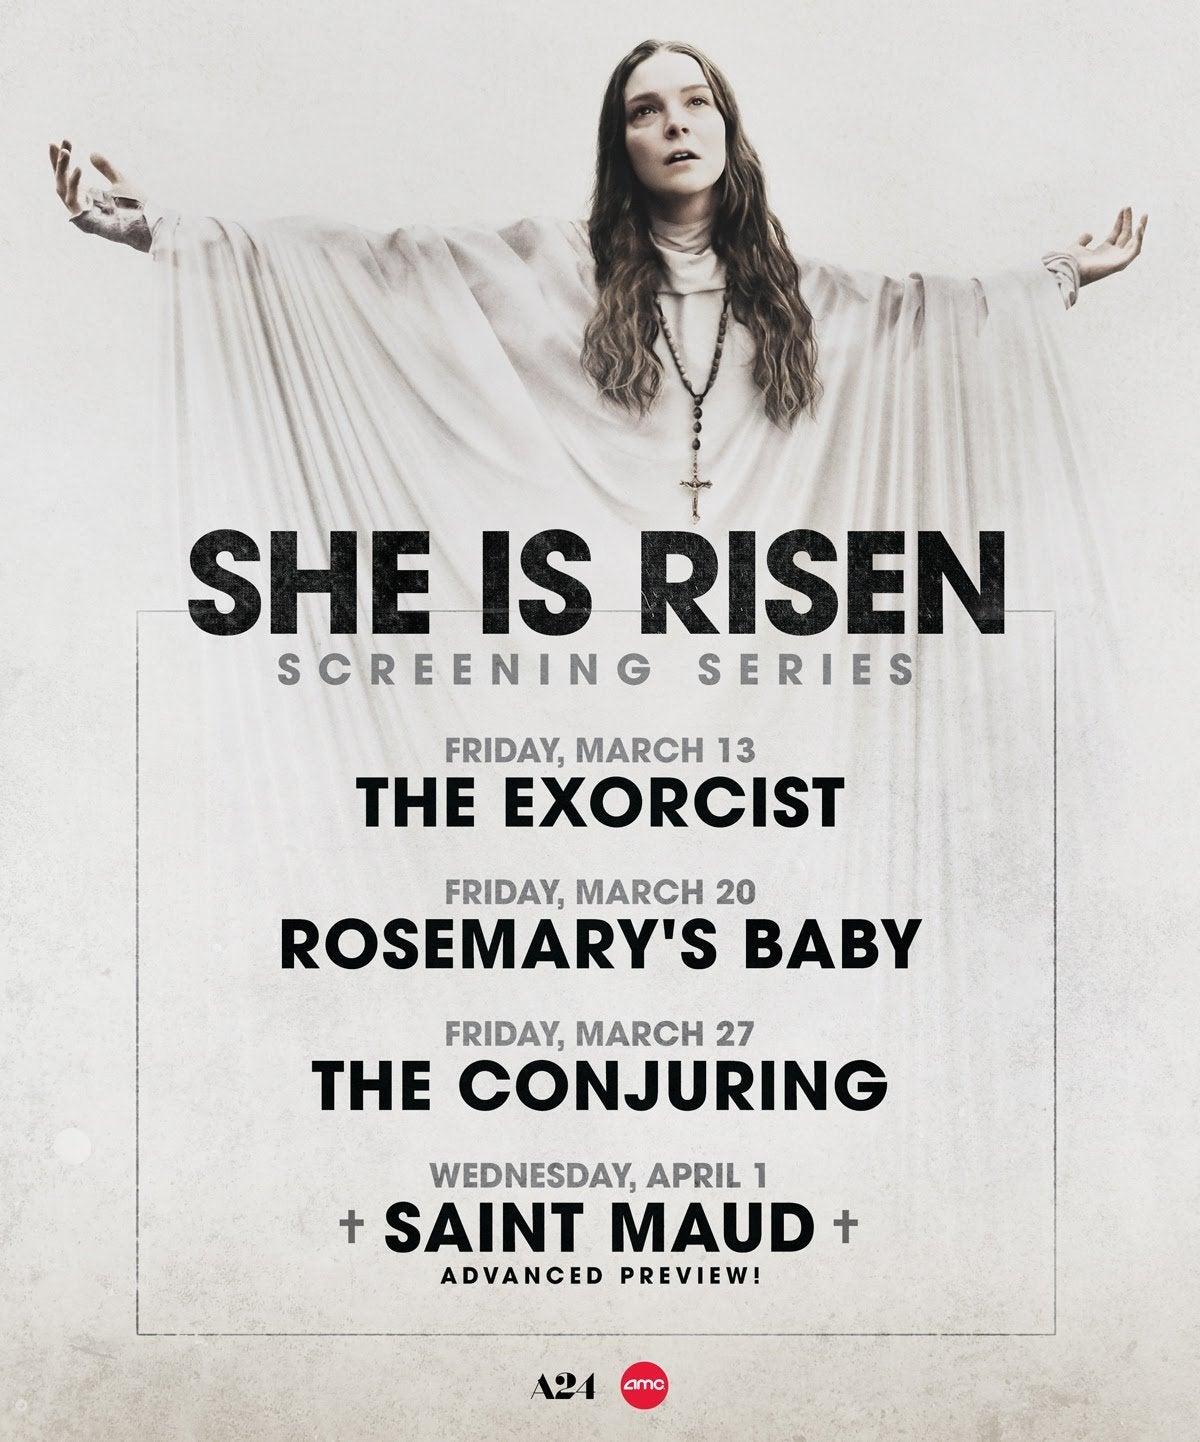 saint maud movie she is risen